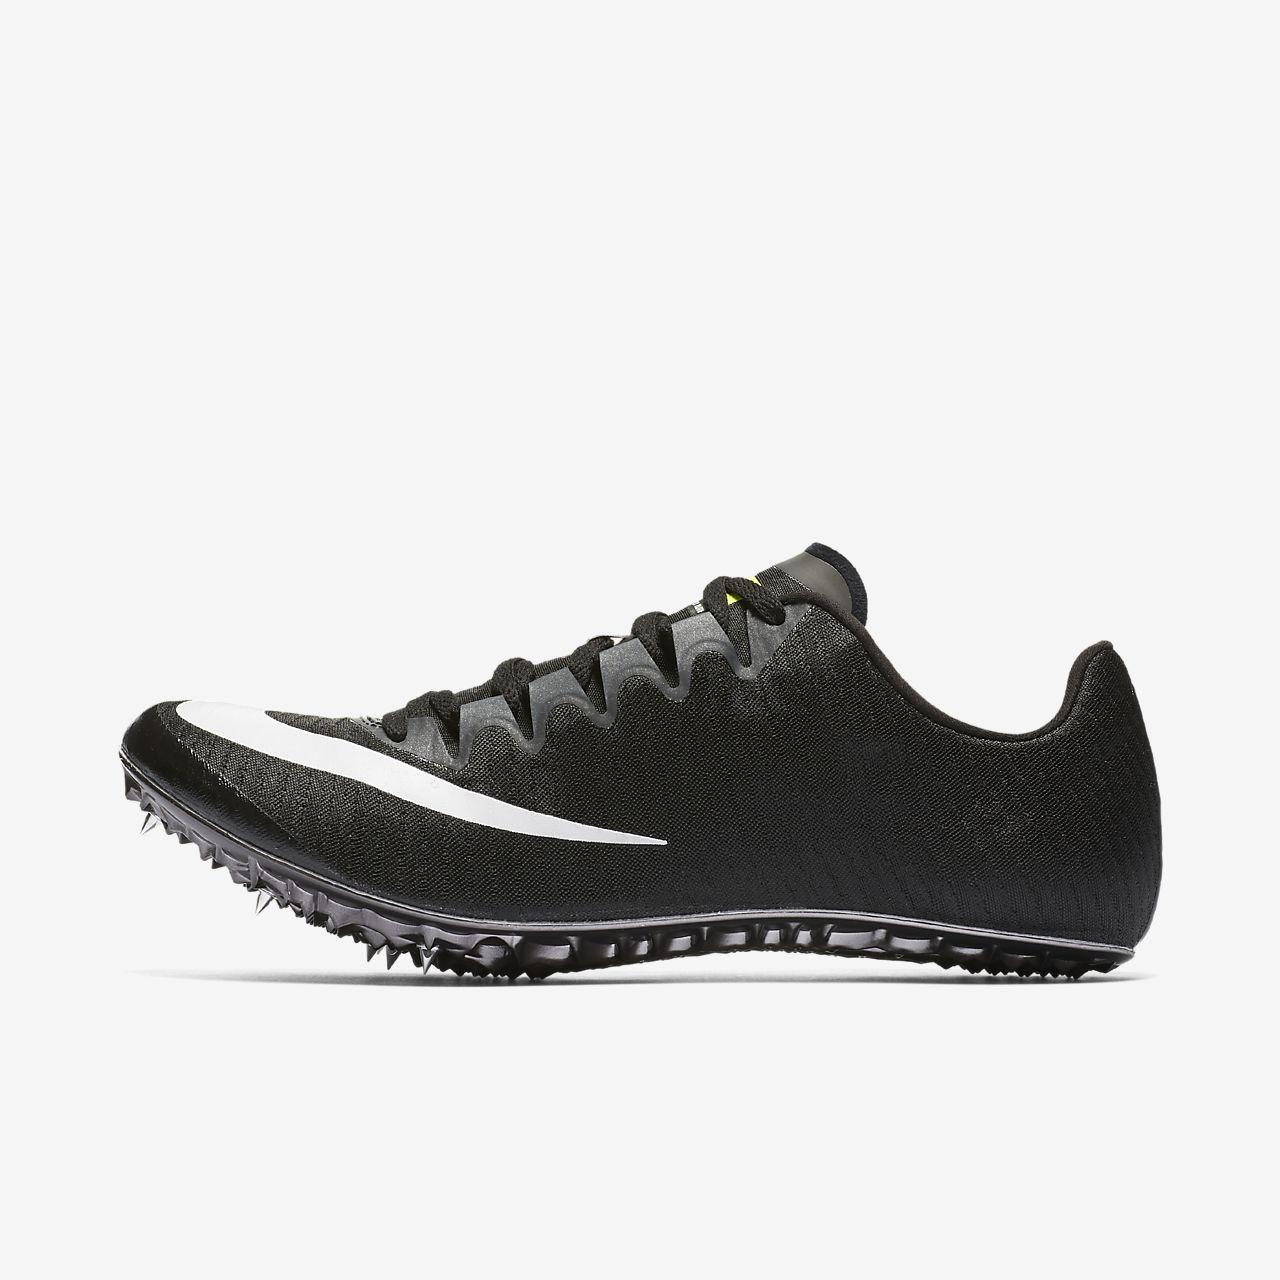 Nike Superfly Elite Women's Running Shoes Black/Green/White qG9623W